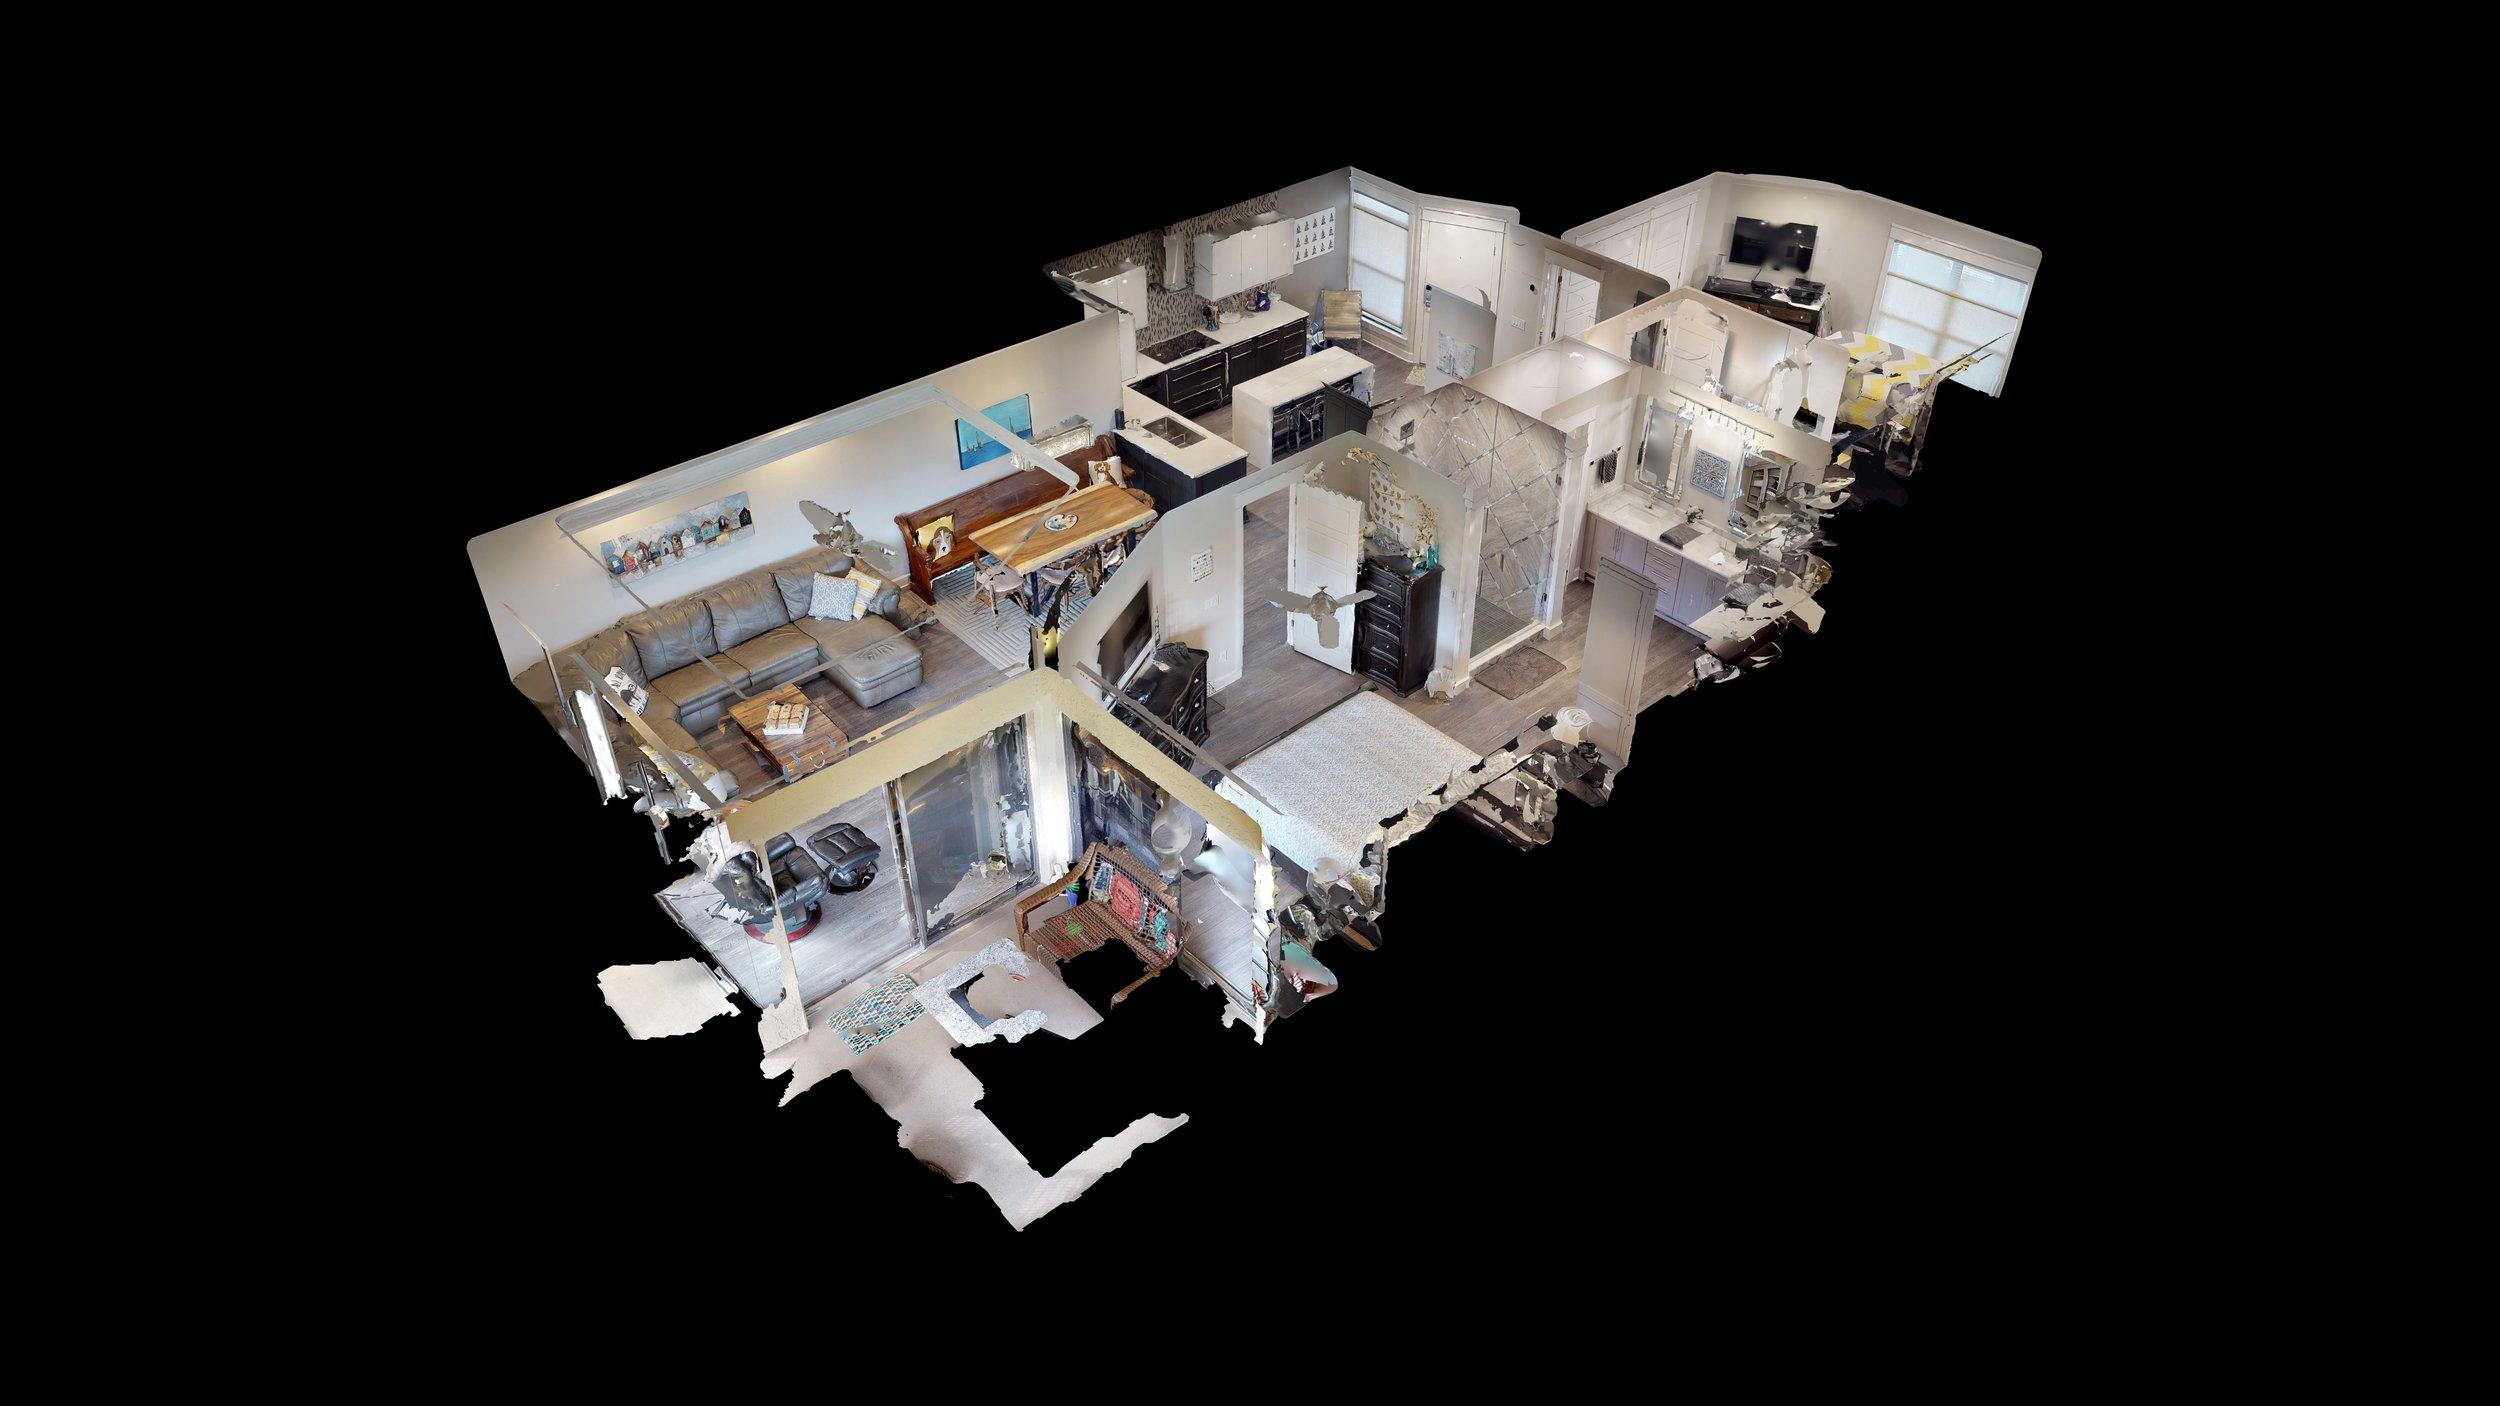 314-Caribe-Vista-Dollhouse-View.jpg